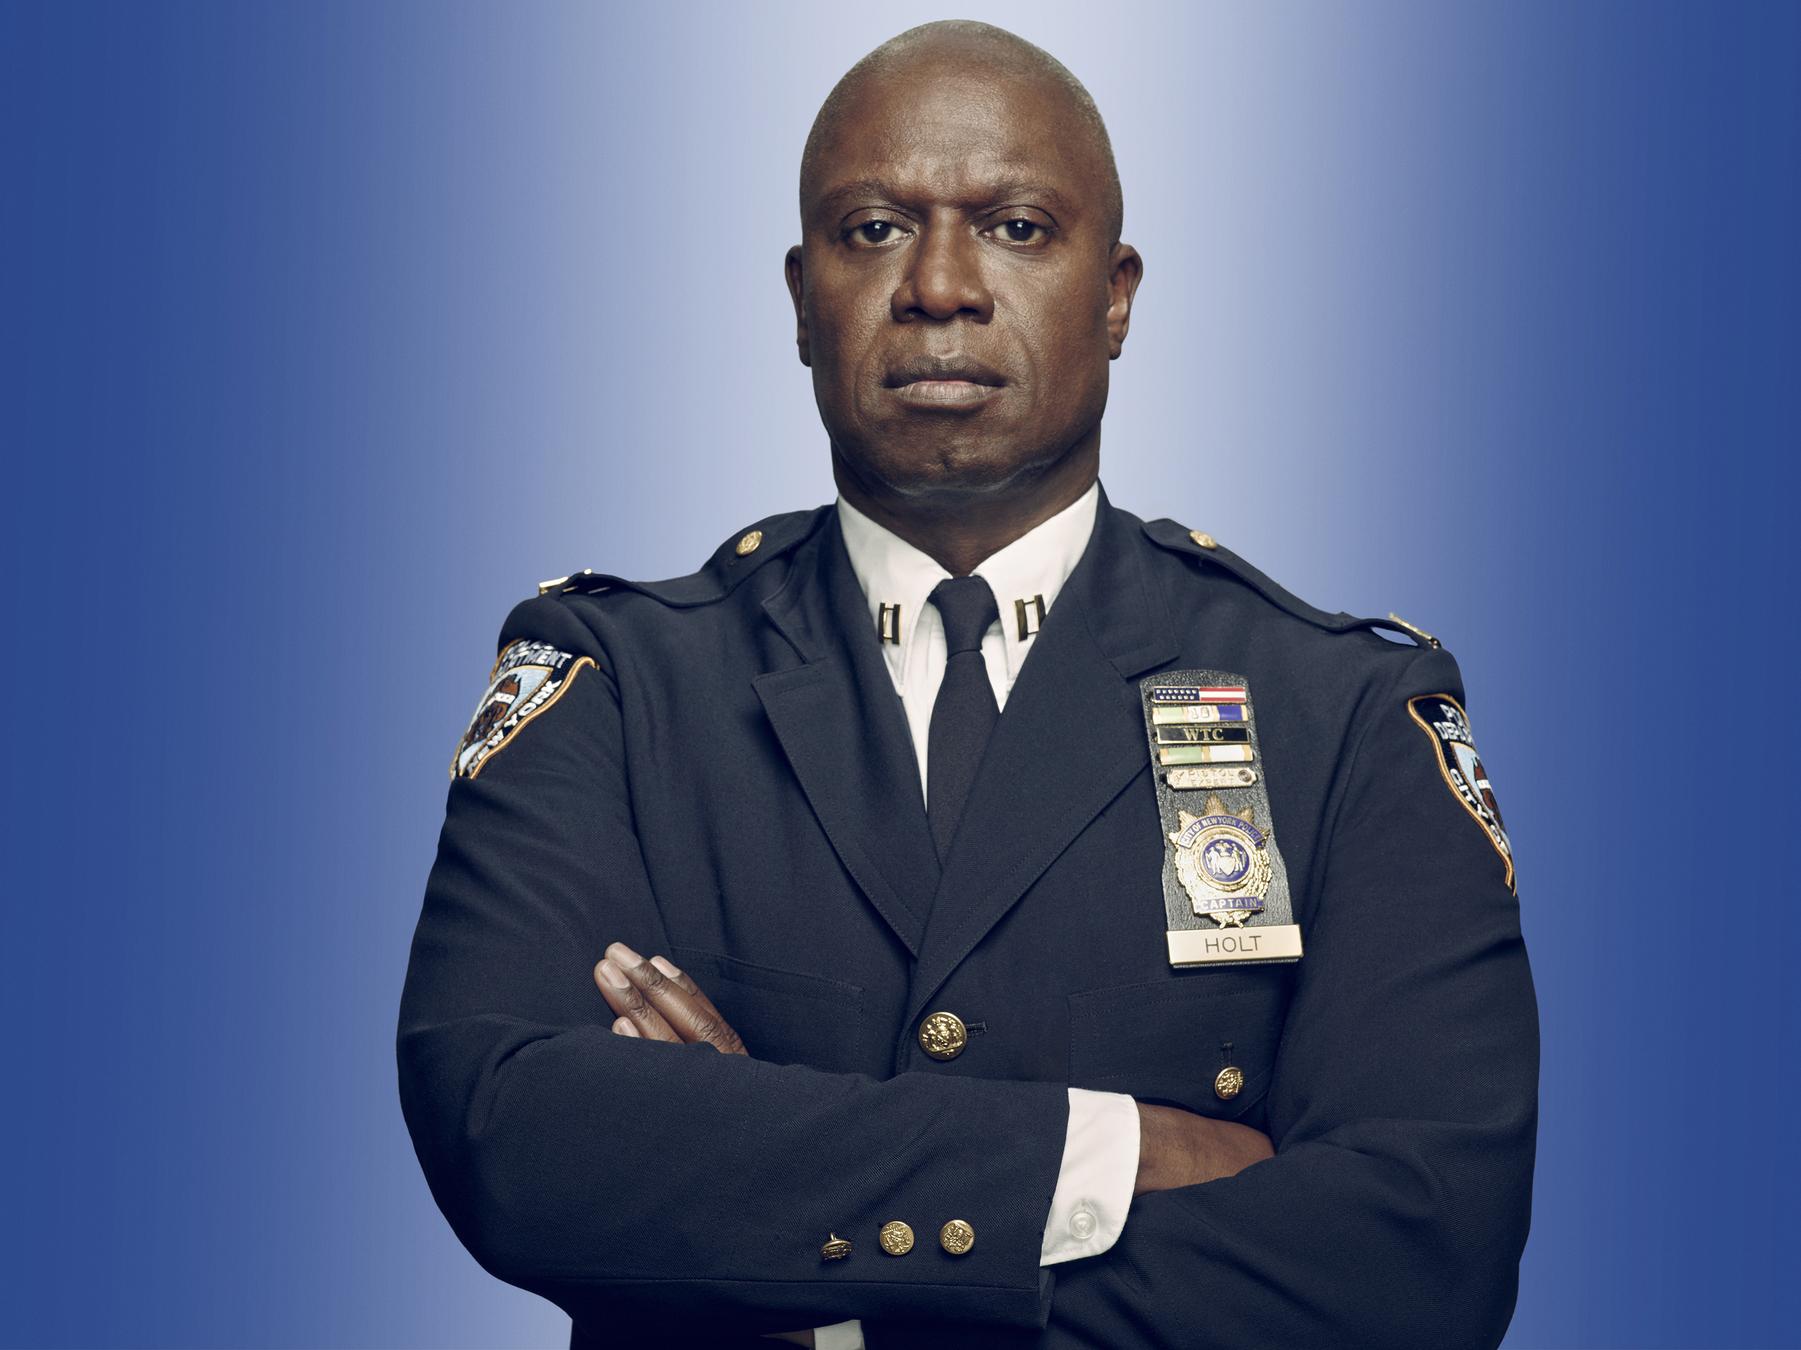 Andre Braugher in Brooklyn Nine-Nine (2013)